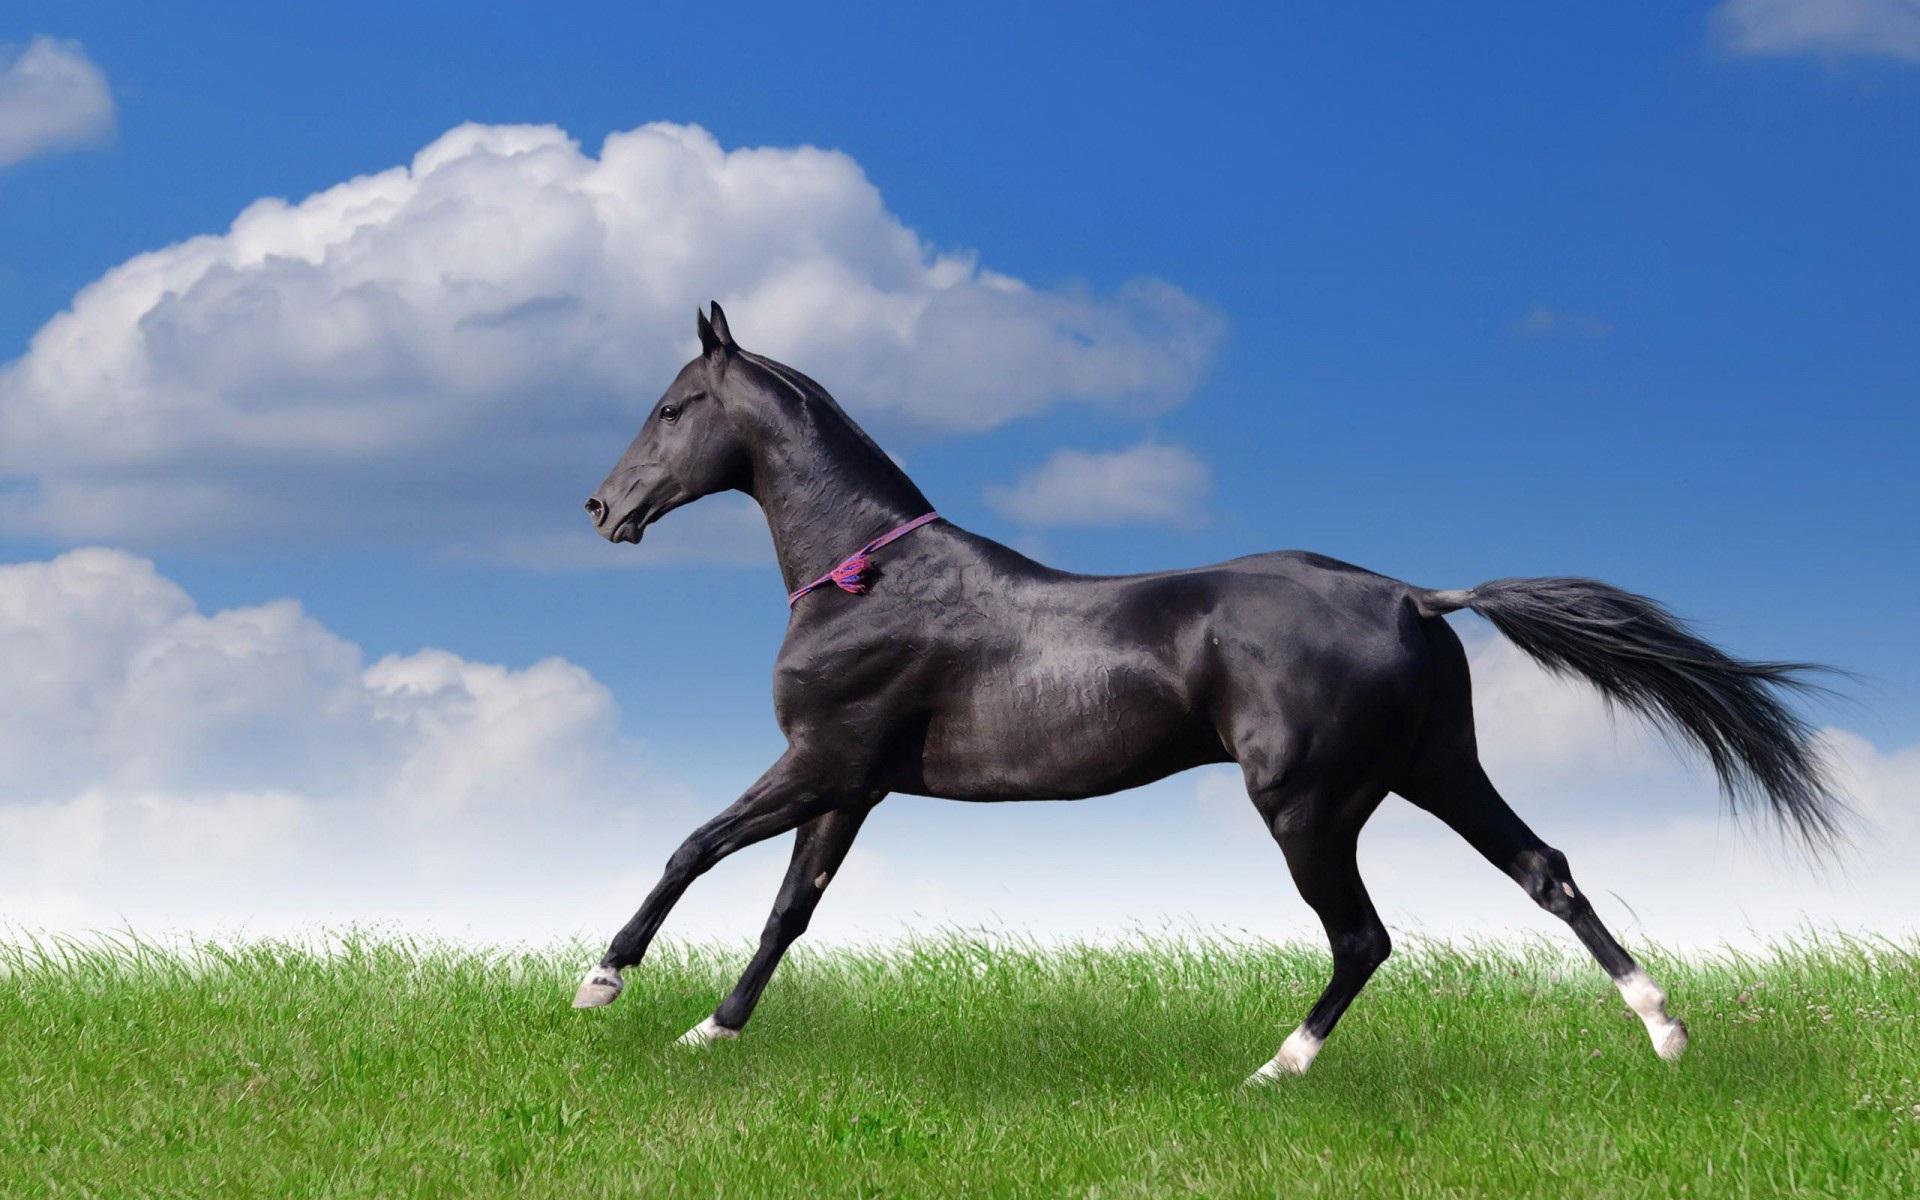 Fall Desktop Wallpaper Full Screen Download Free Black Horse Backgrounds Pixelstalk Net